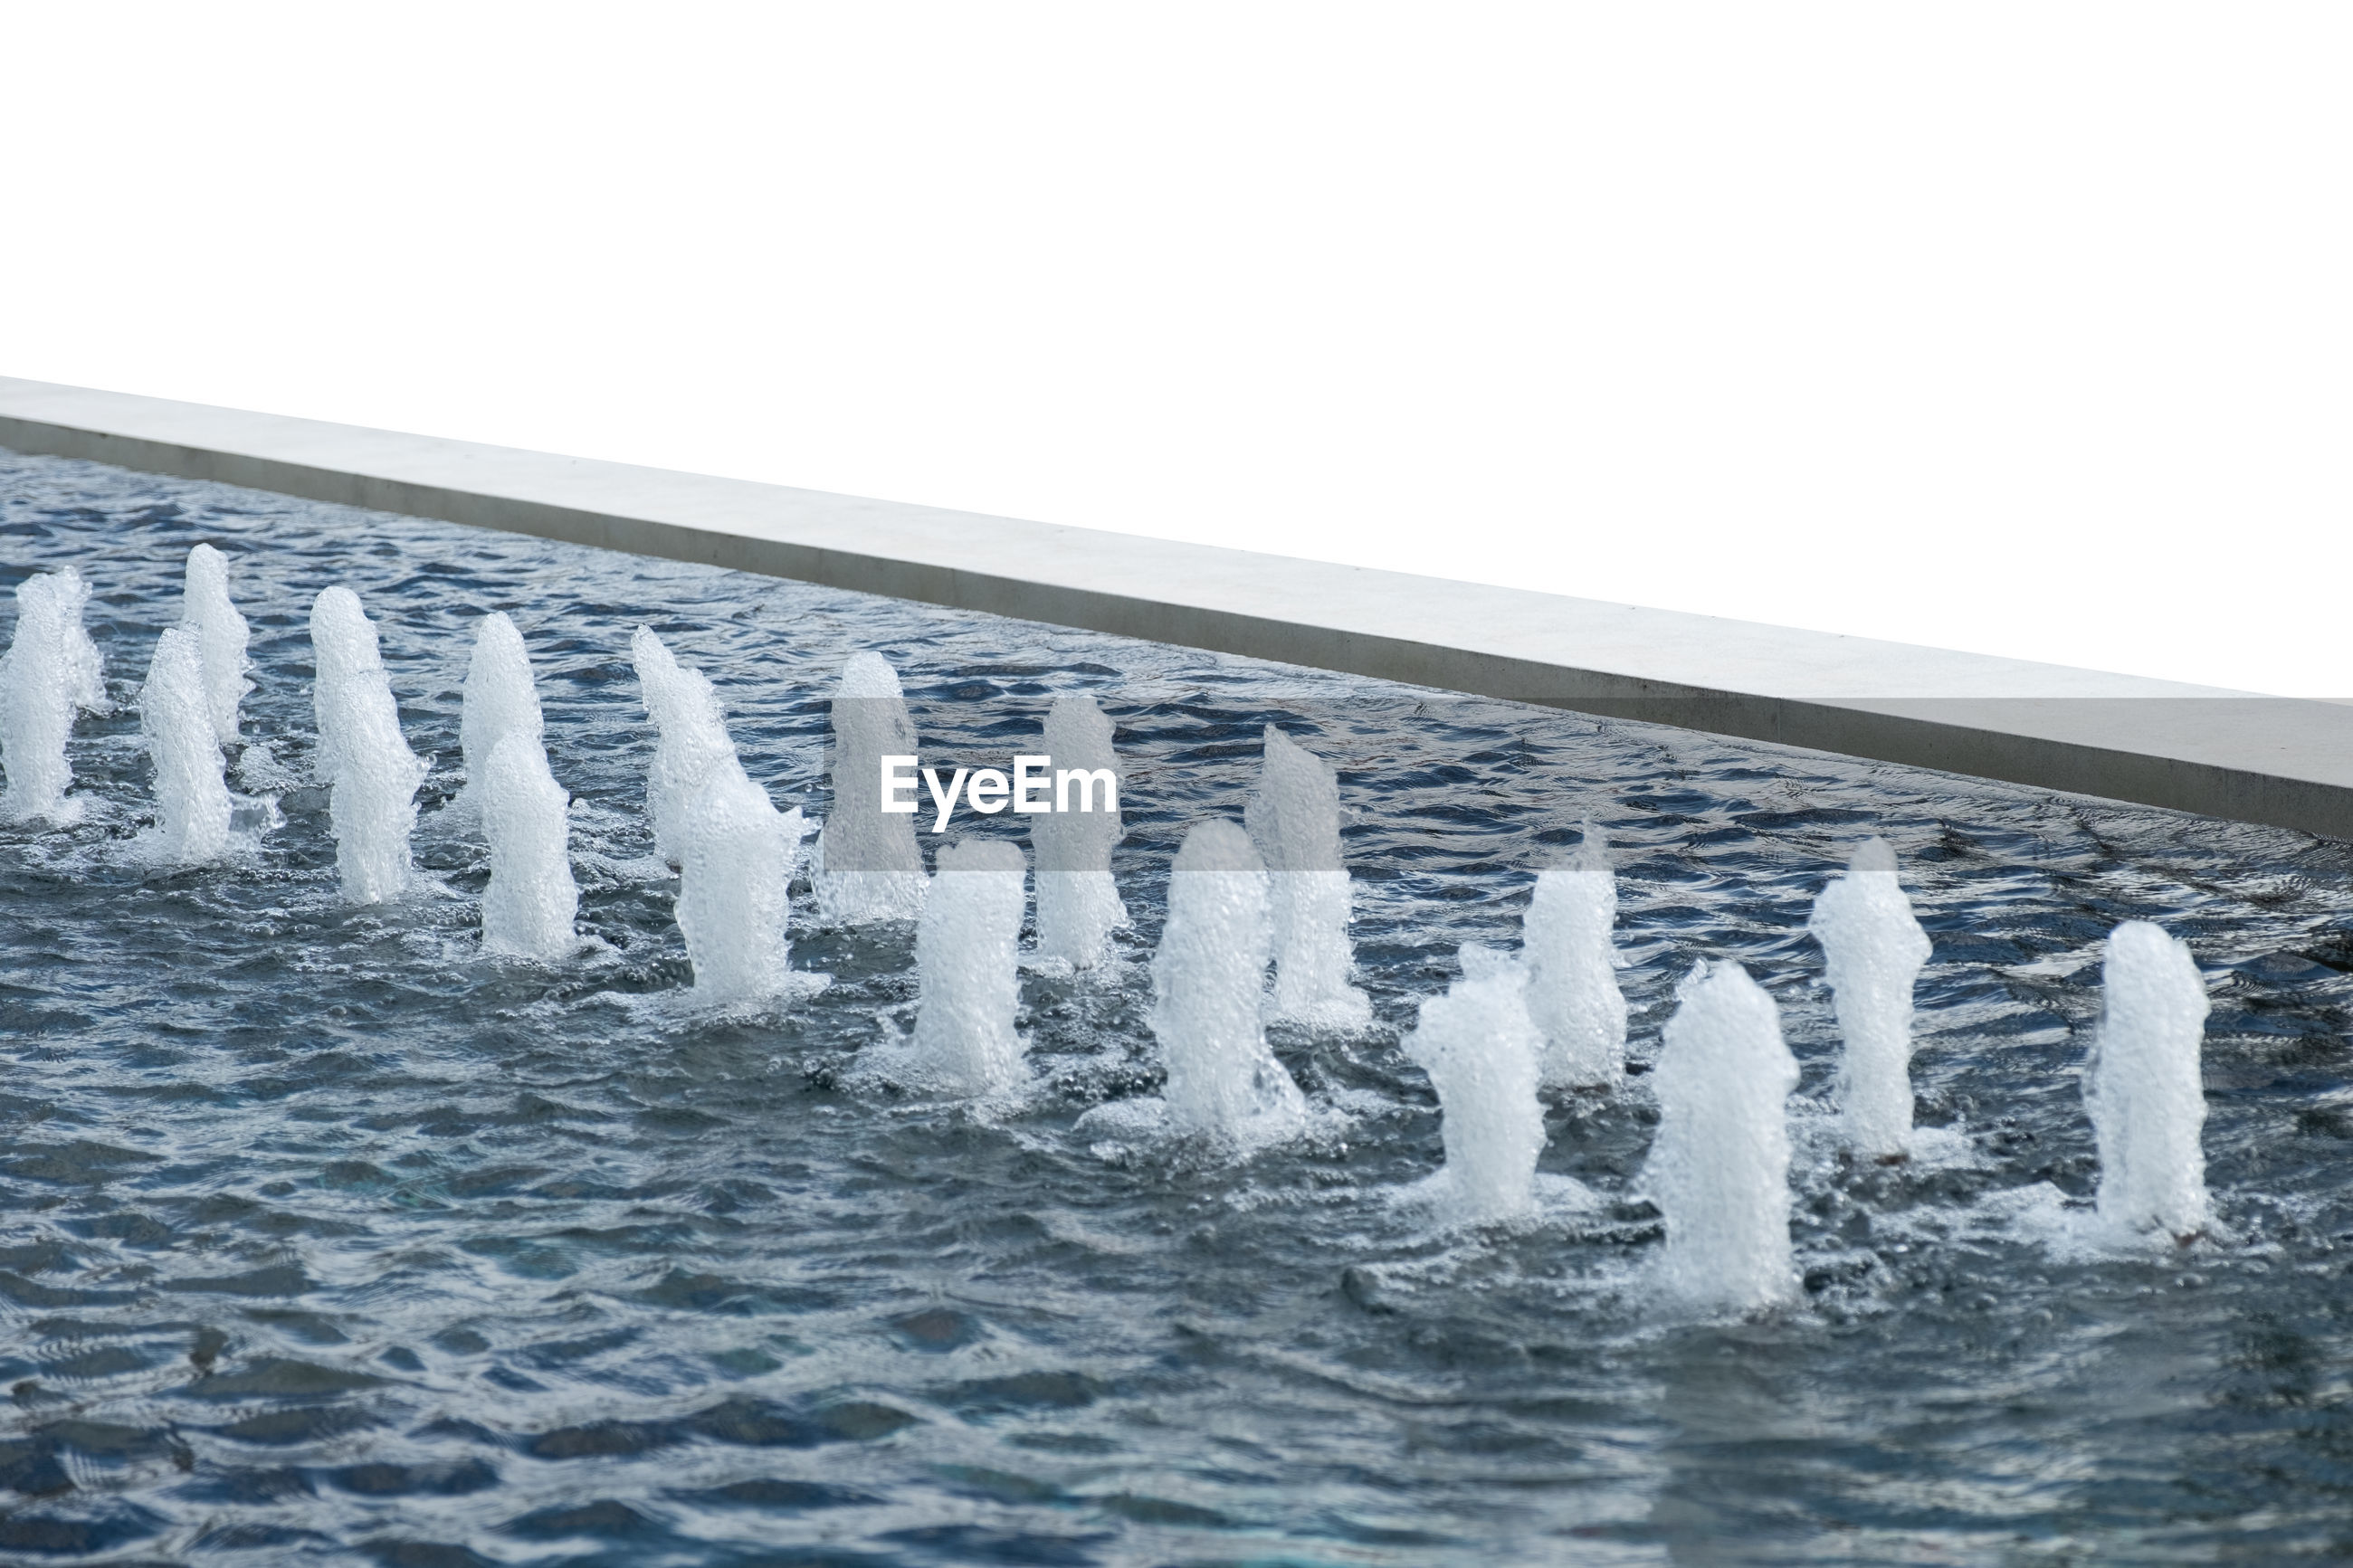 WATER SPLASHING IN ROW AGAINST CLEAR SKY